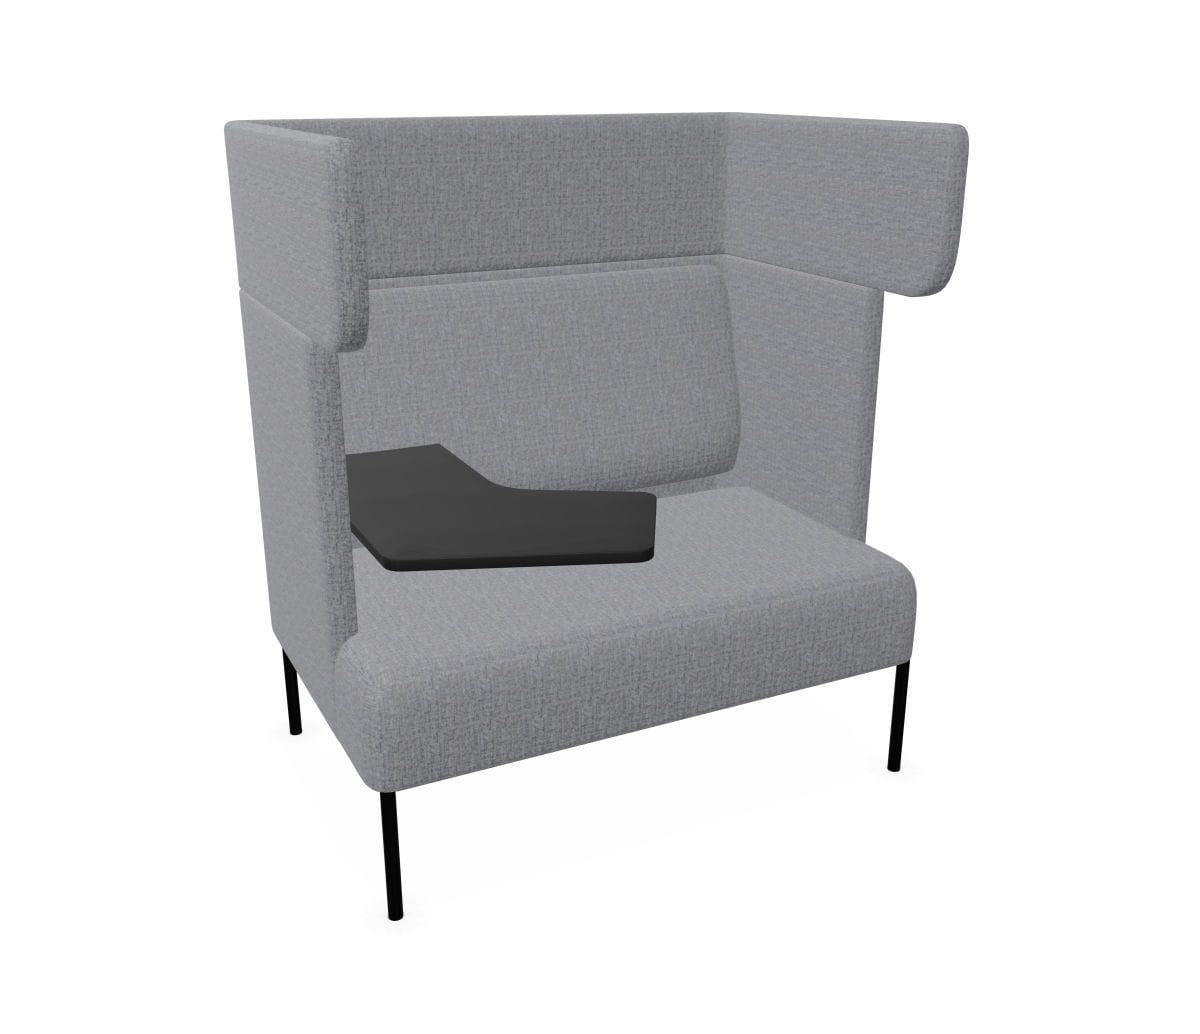 Tremendous Contemporary Sofa Fabric Commercial High Back Fourus Customarchery Wood Chair Design Ideas Customarcherynet